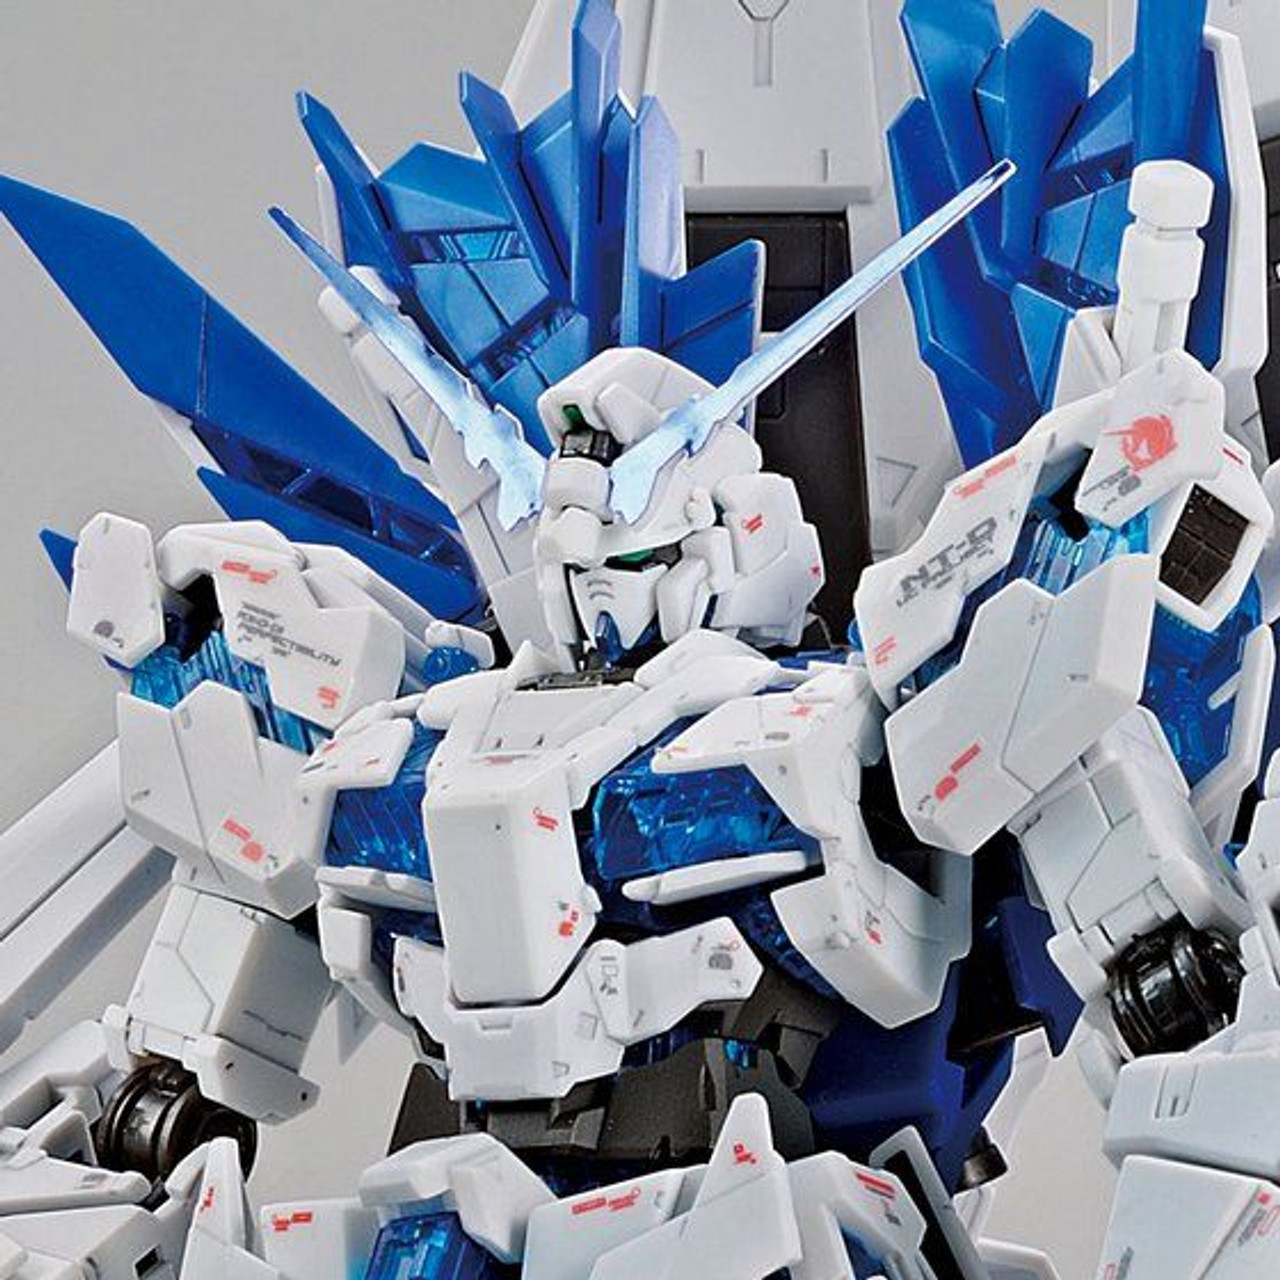 Rg 1 144 The Gundam Base Limited Unicorn Gundam Perfectibility Plastic Model Oct 2021 Kurama Toys Online Shop